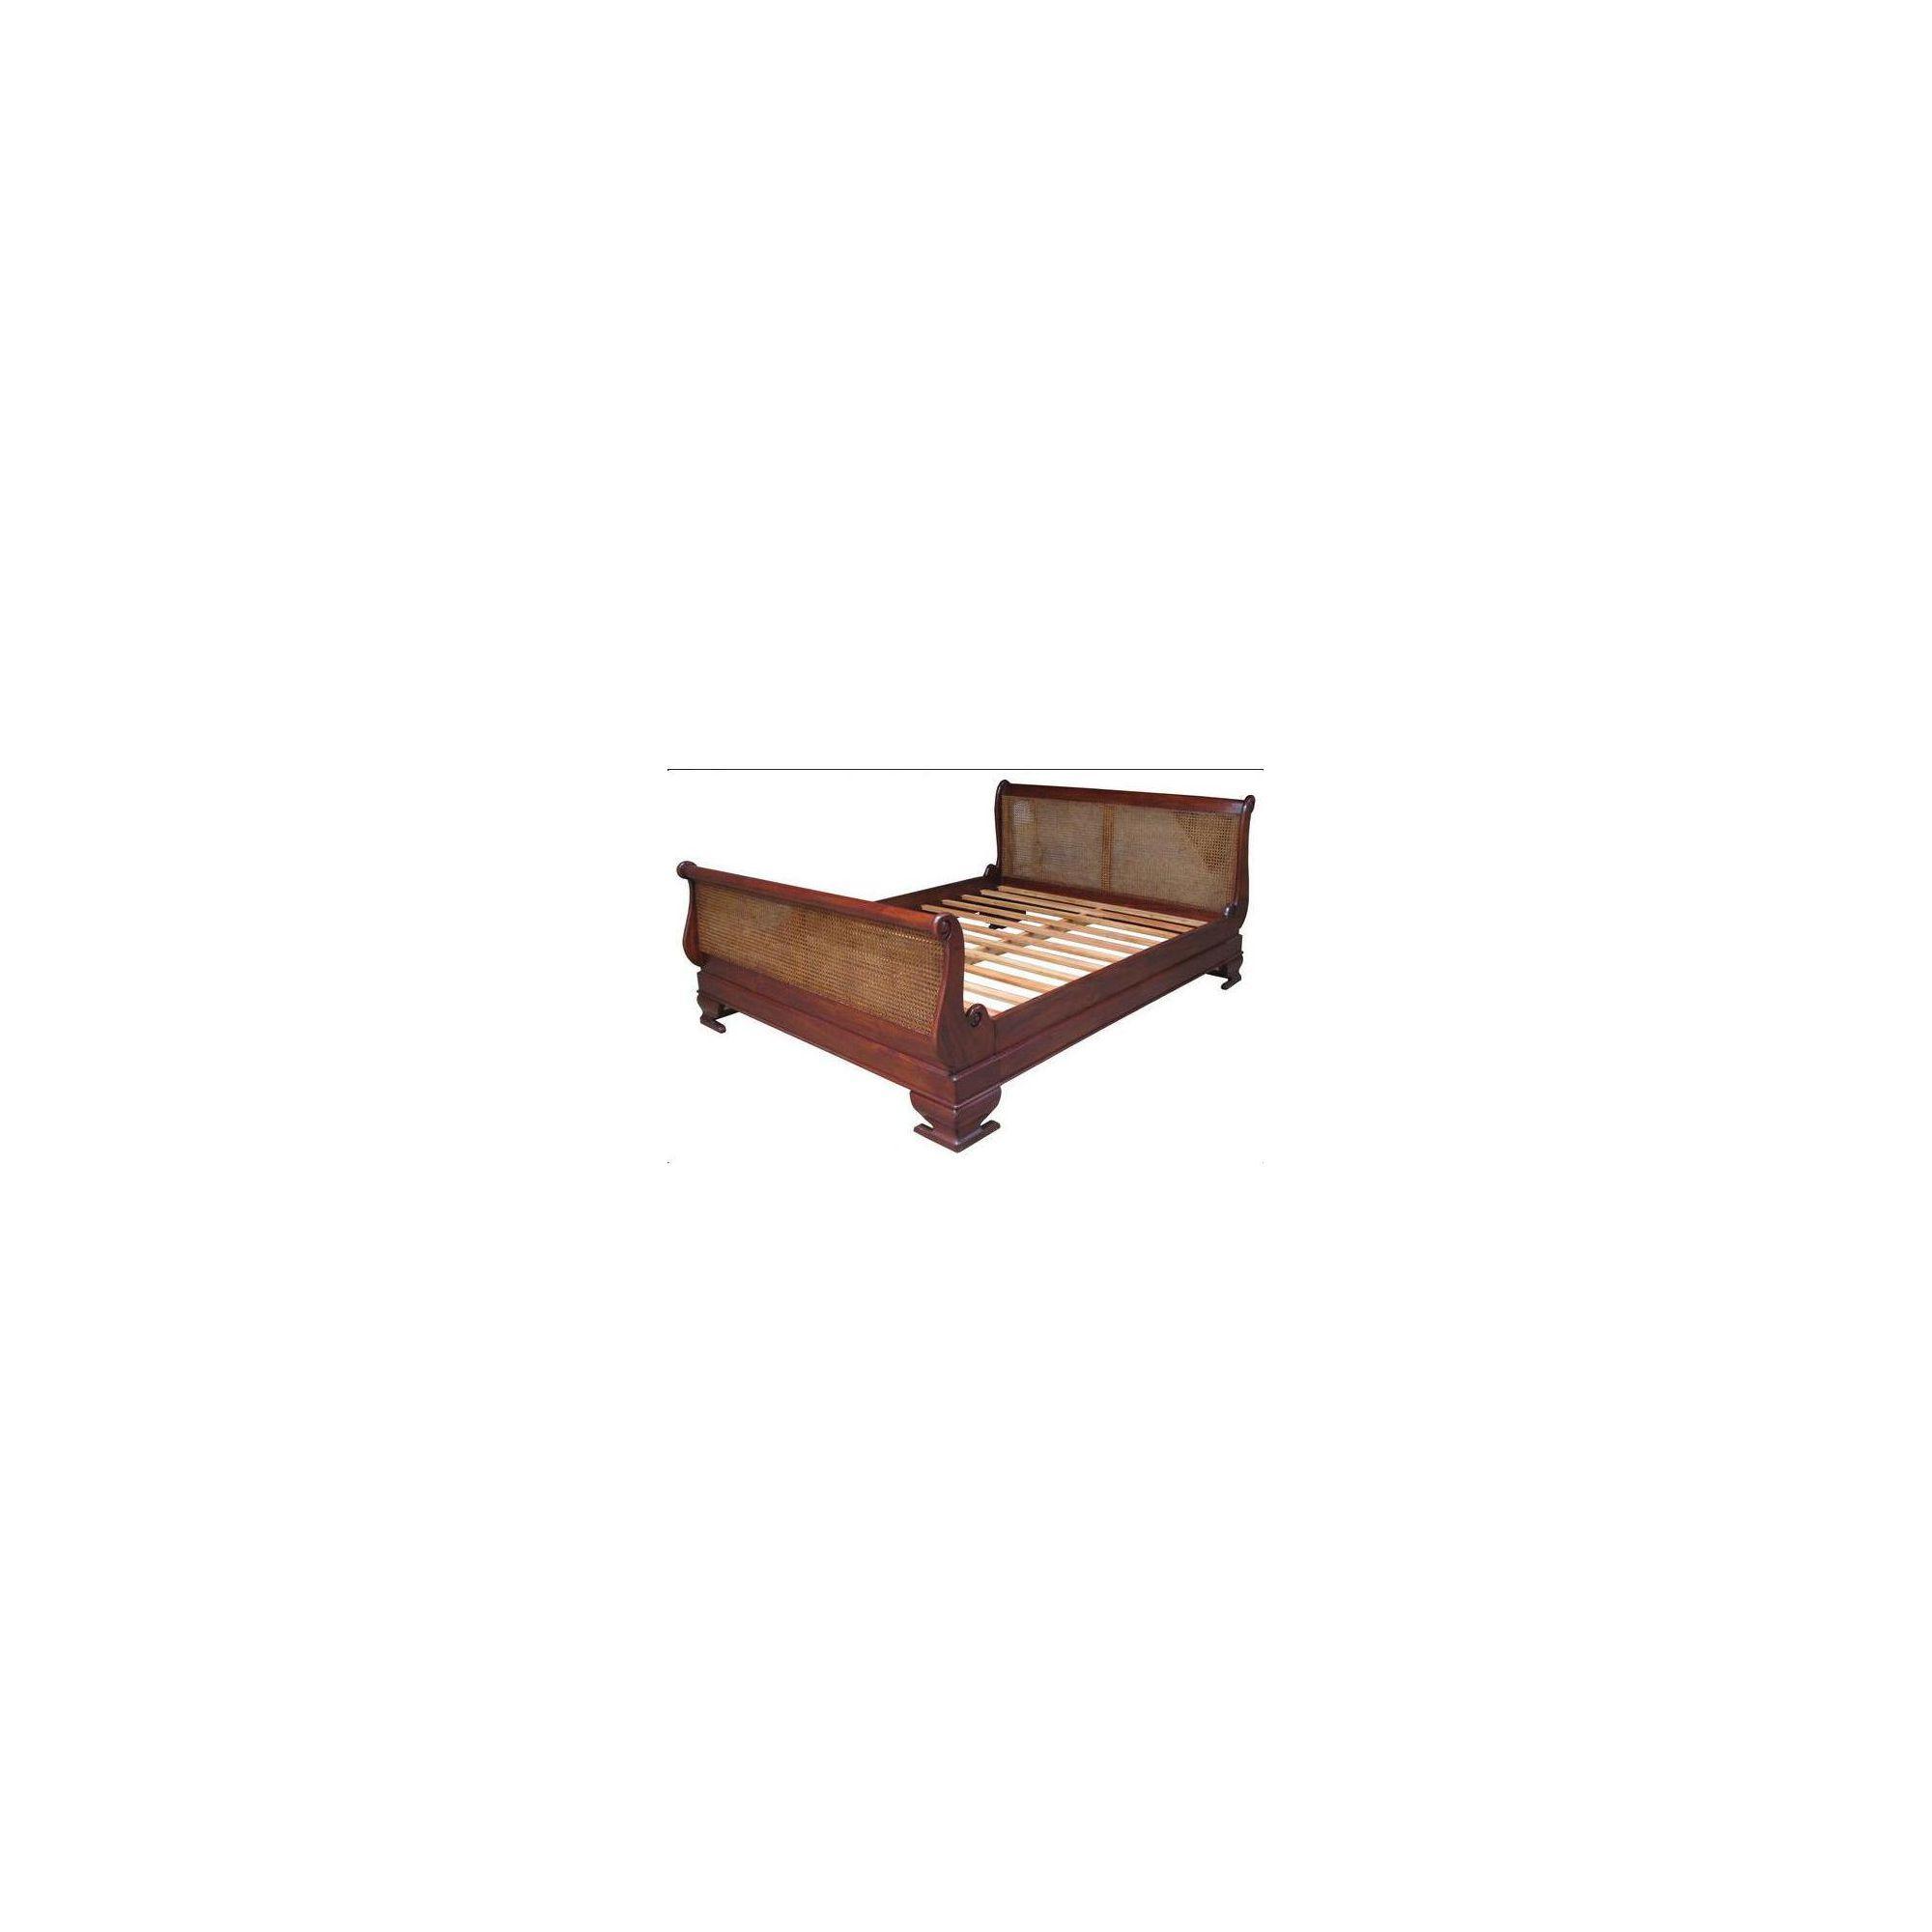 Lock stock and barrel Mahogany Rattan Sleigh Bed in Mahogany - Wax - Double at Tesco Direct